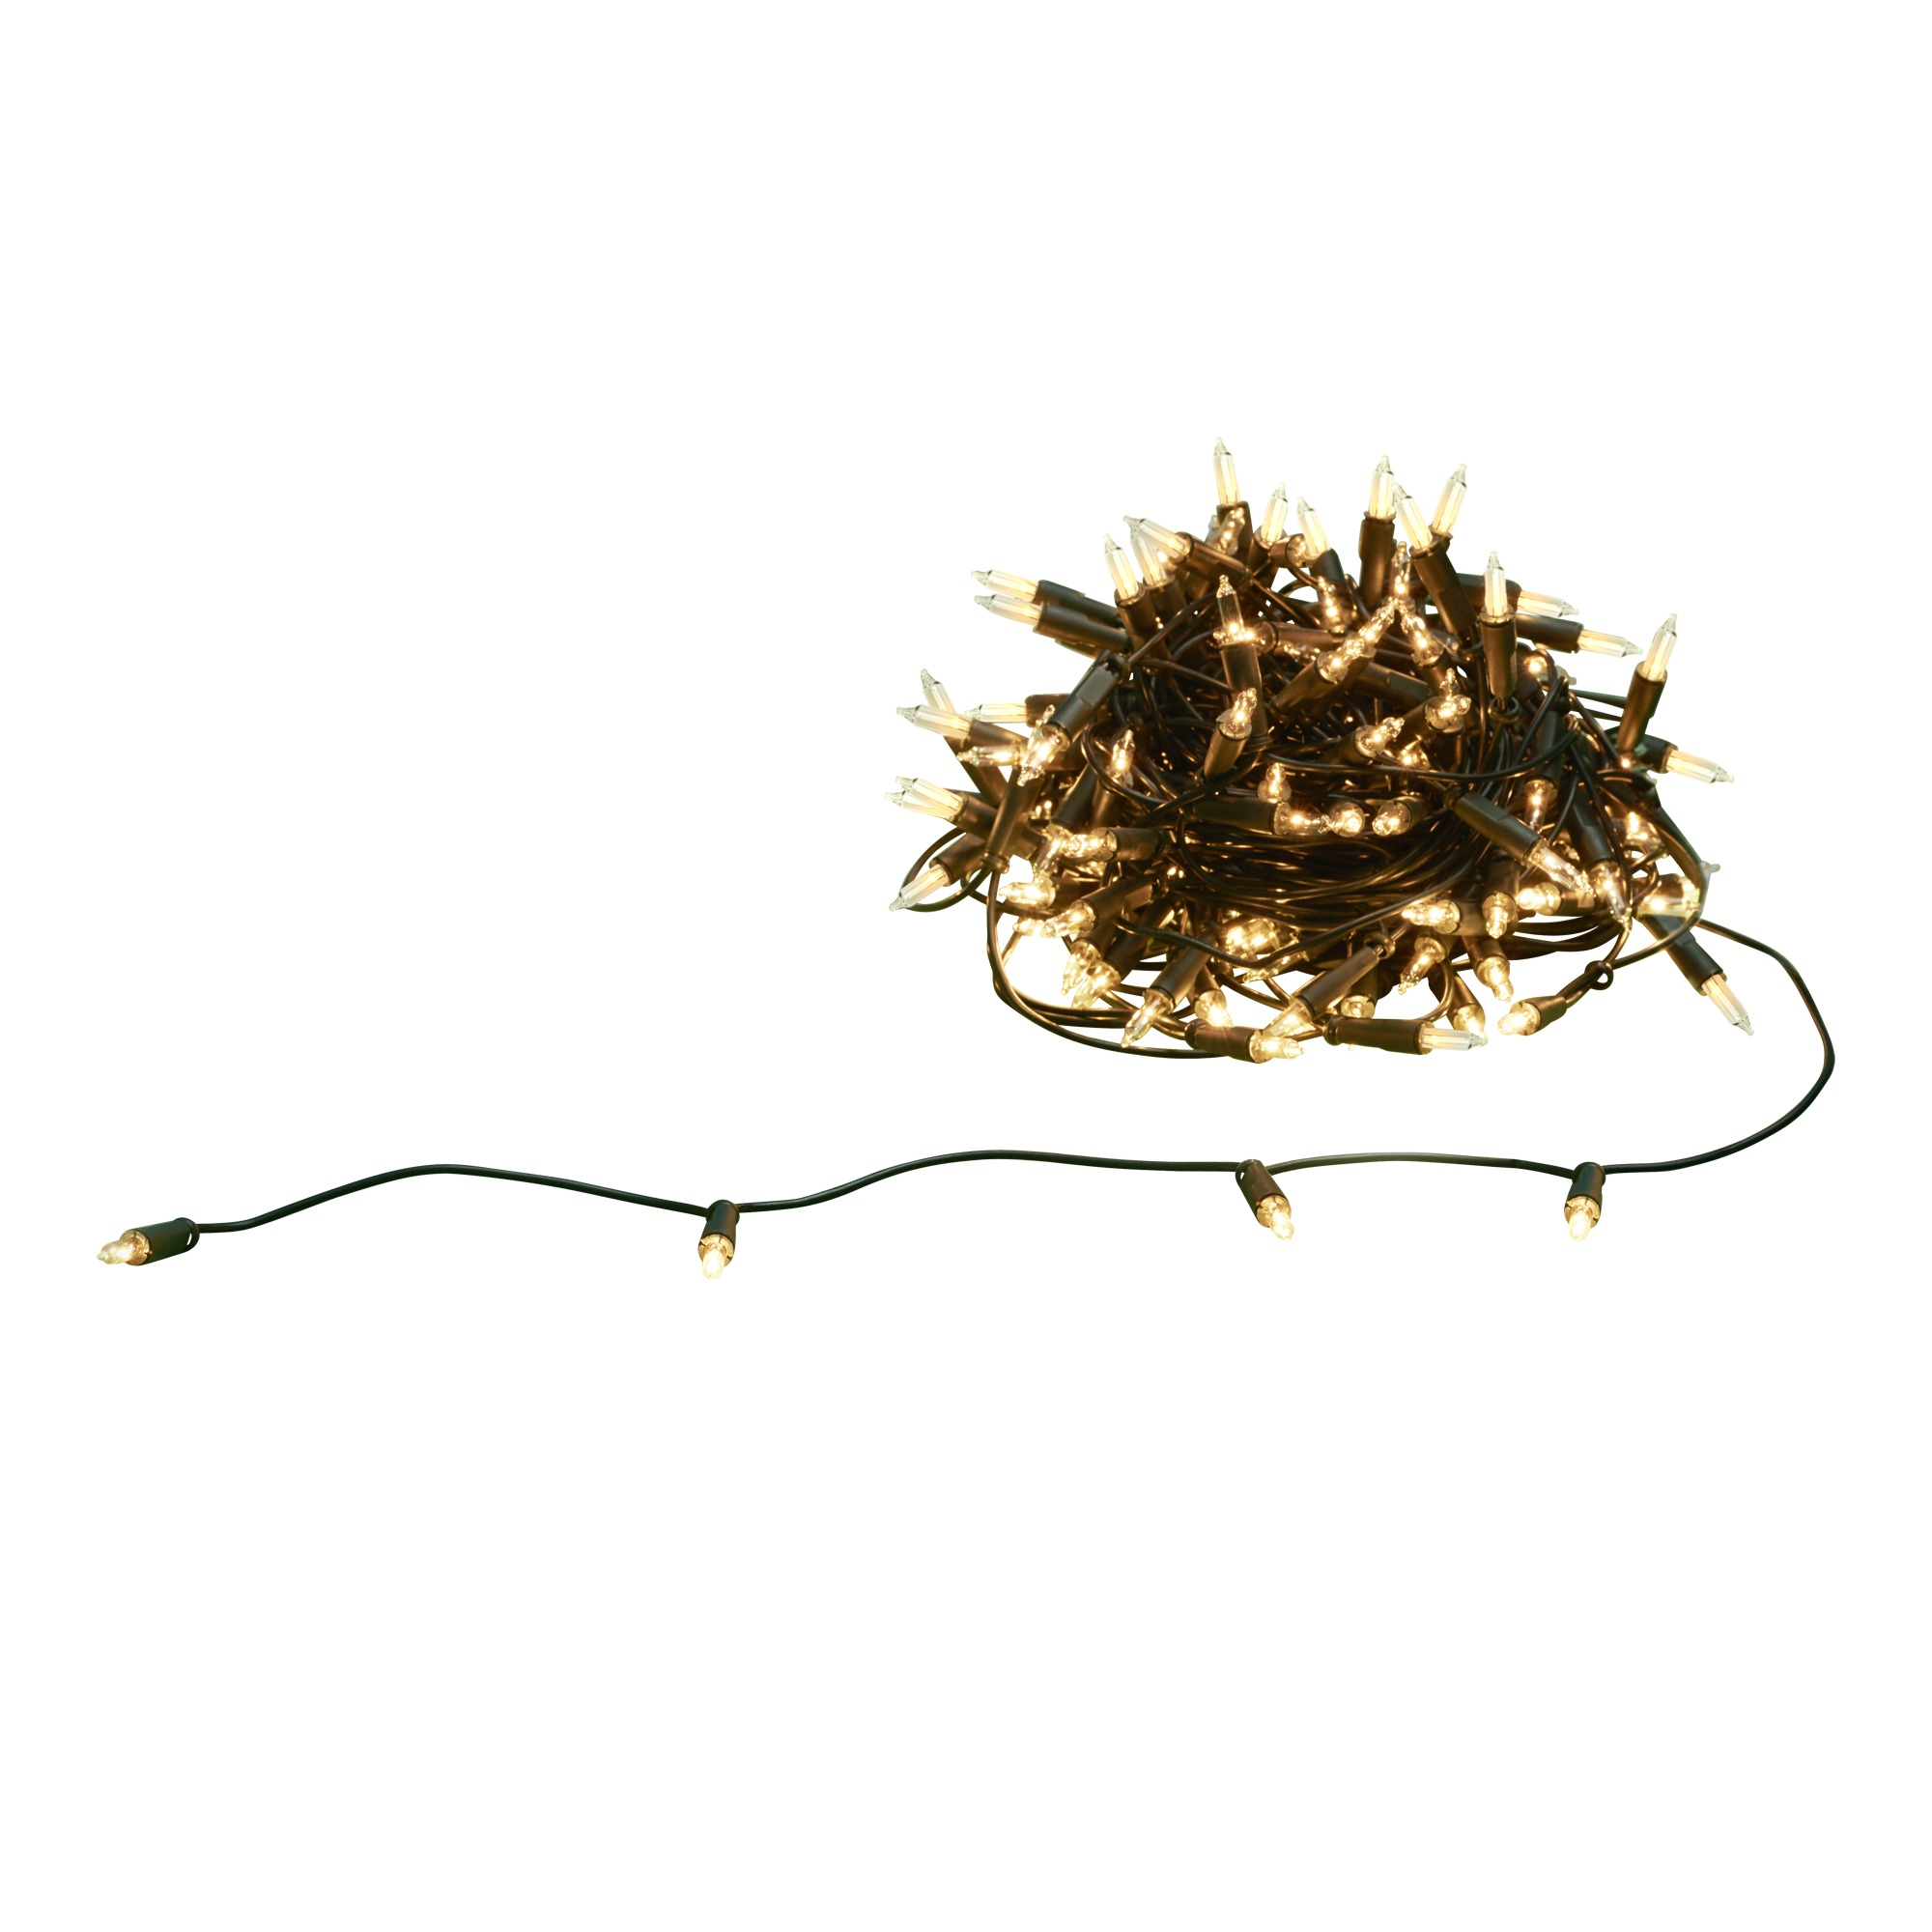 Kerstverlichting binnen mini 200 lampjes for Gamma verlichting binnen